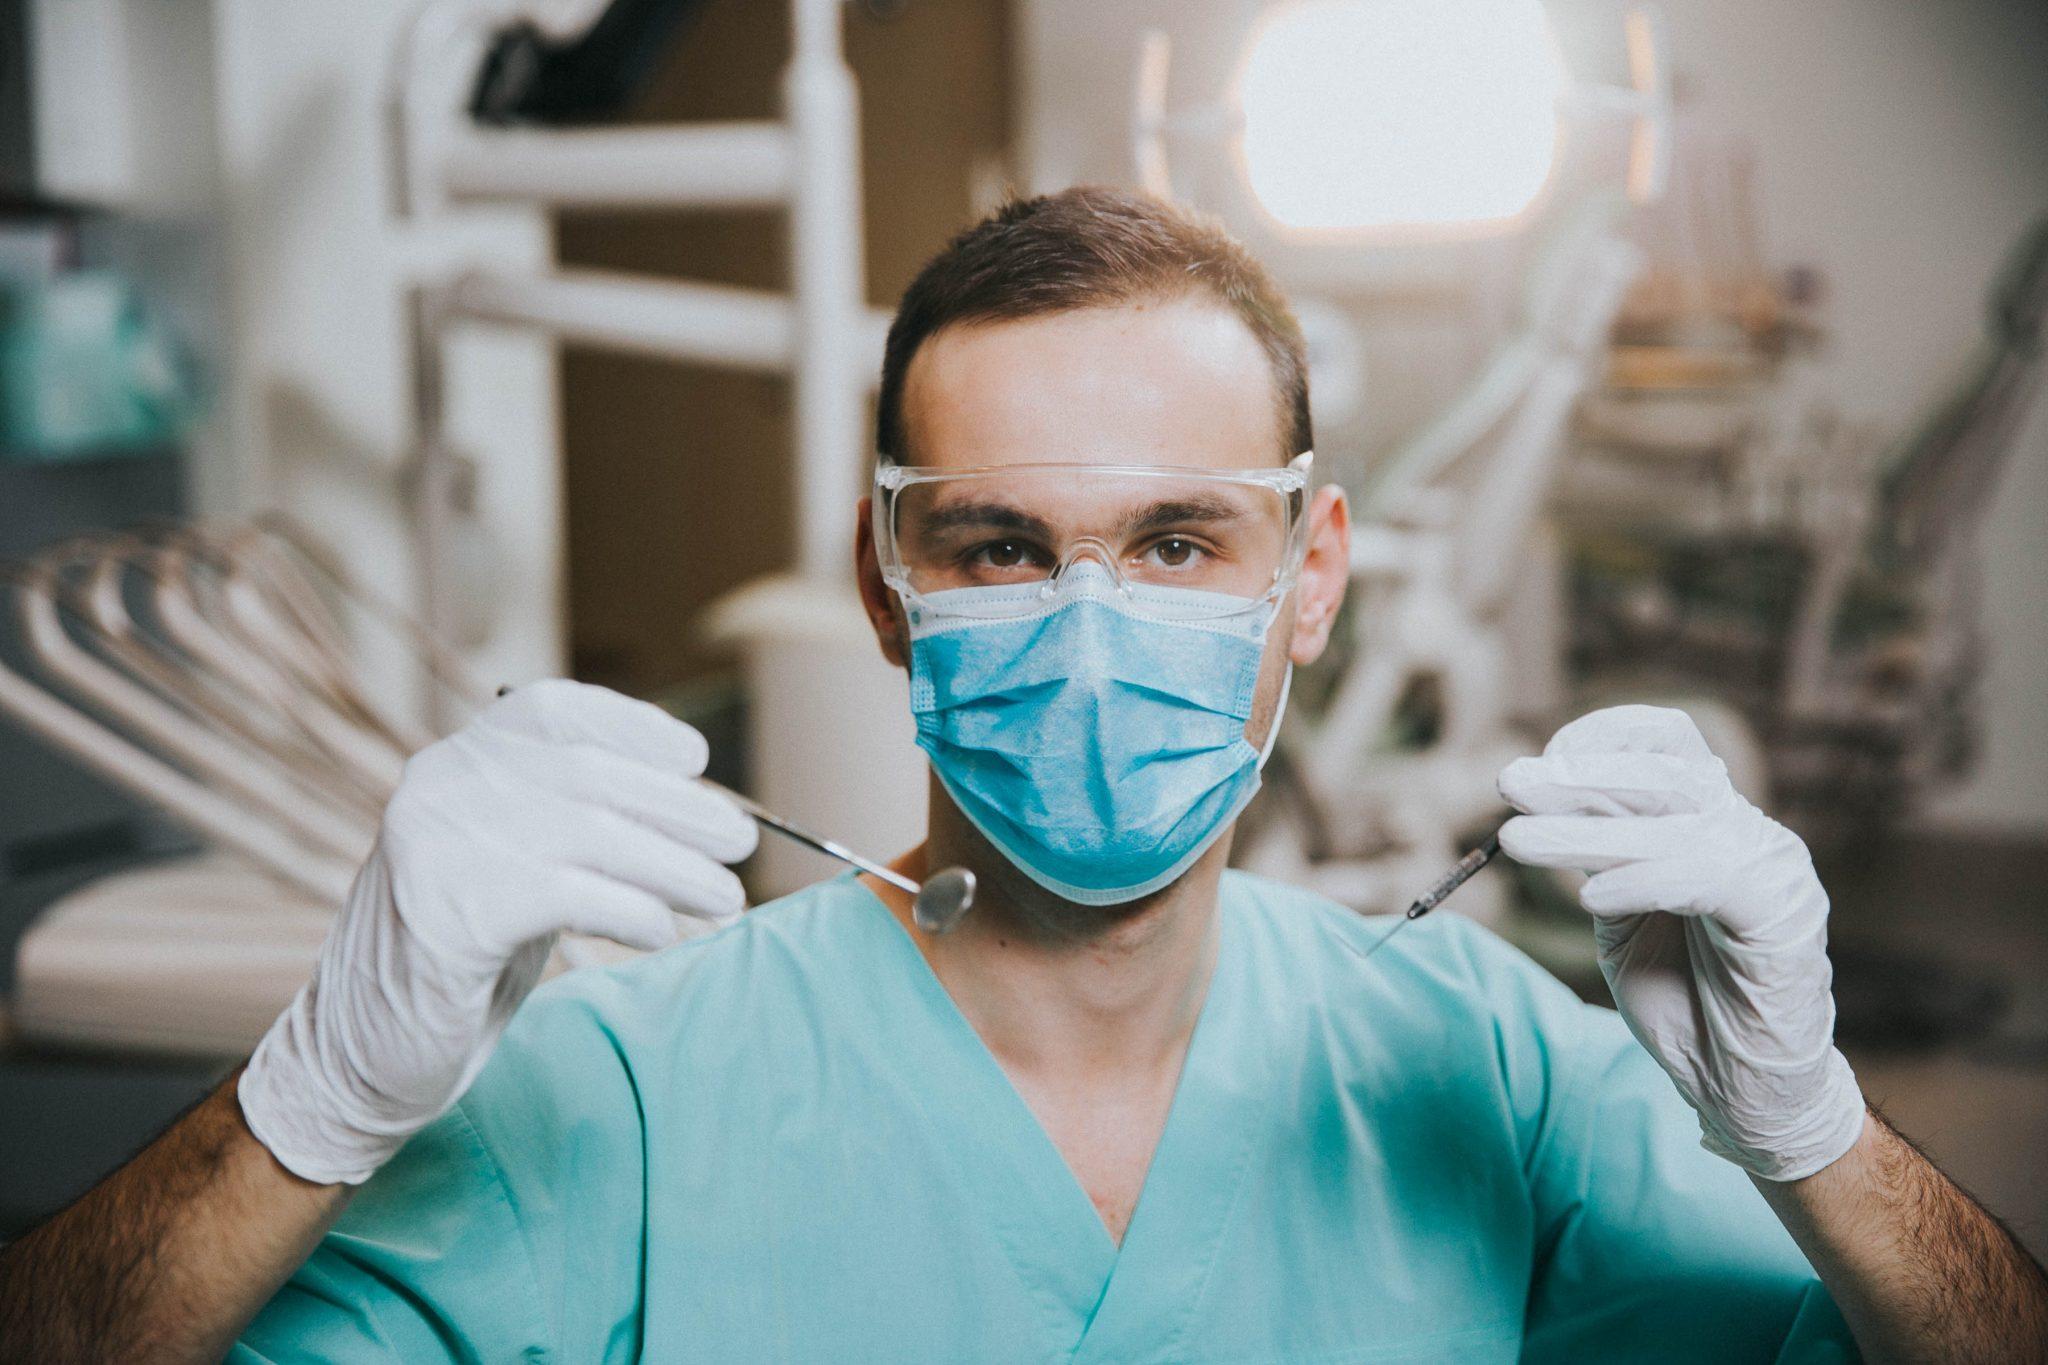 facultatea de stamatologie targu mures UMF absolvenit stamatolog medic doctor fotografie comerciala fotograf profesionist majos daniel_-33